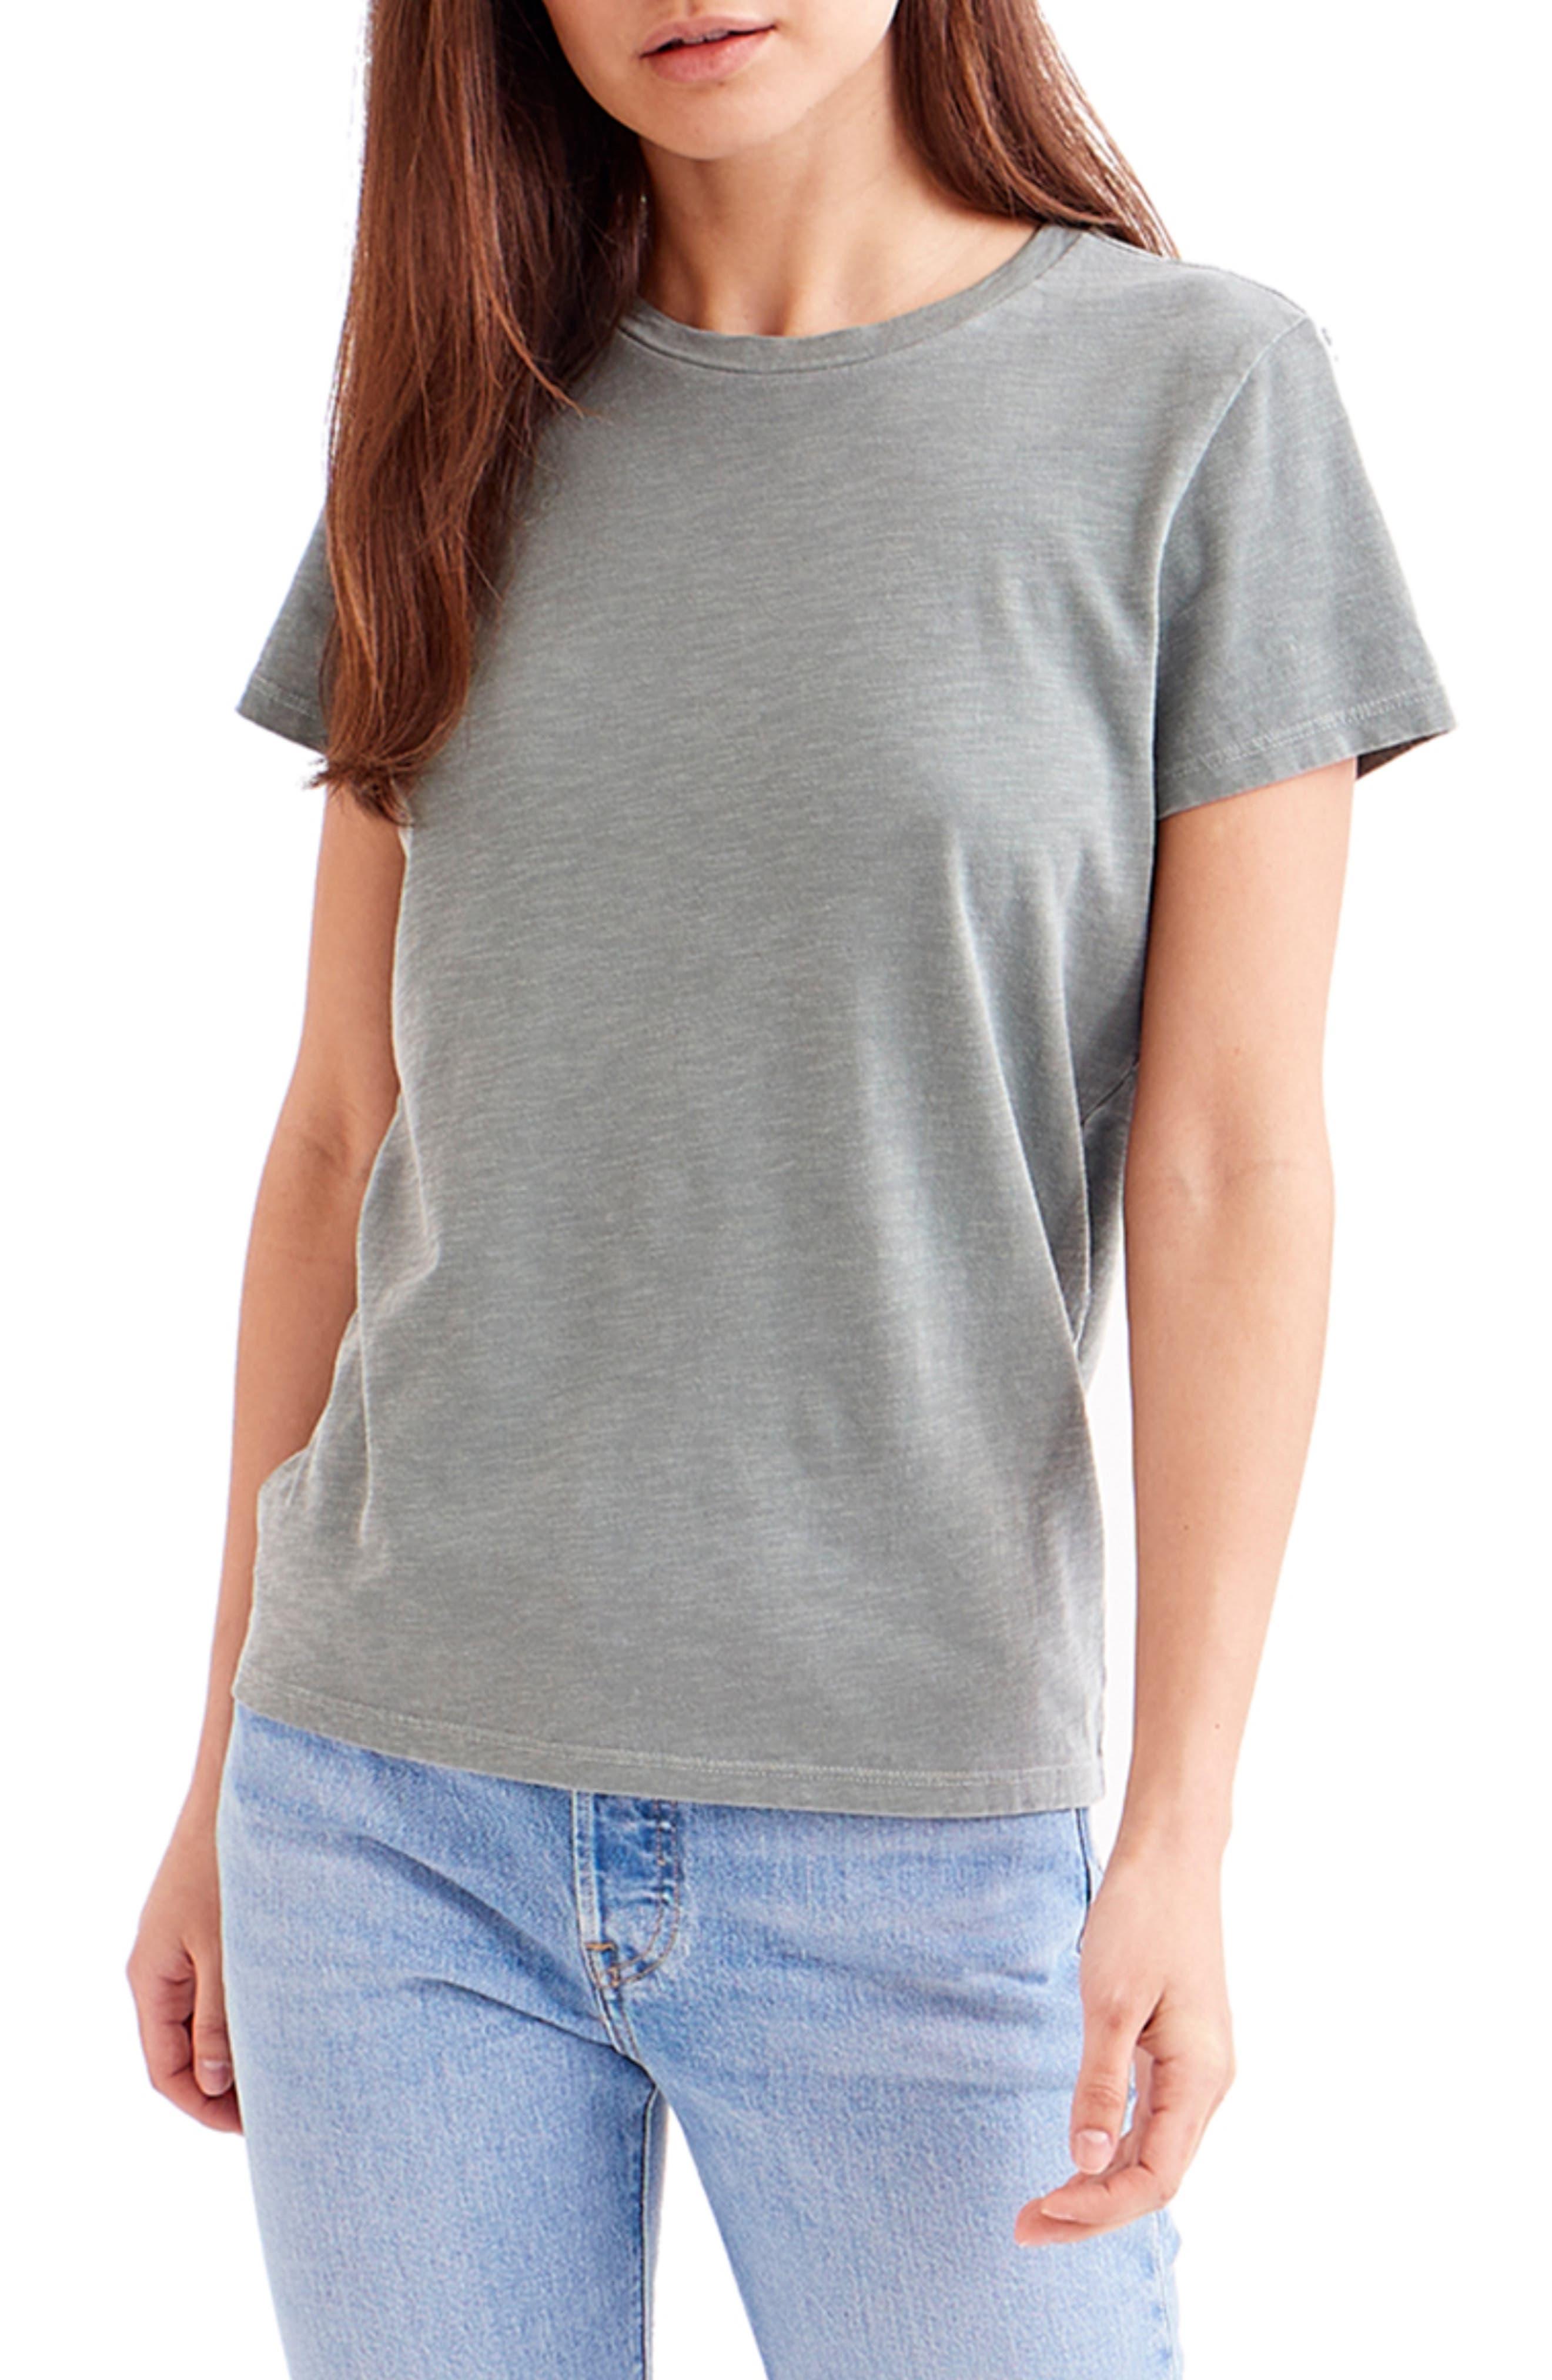 Sunfaded Everyday Cotton Slub T-Shirt